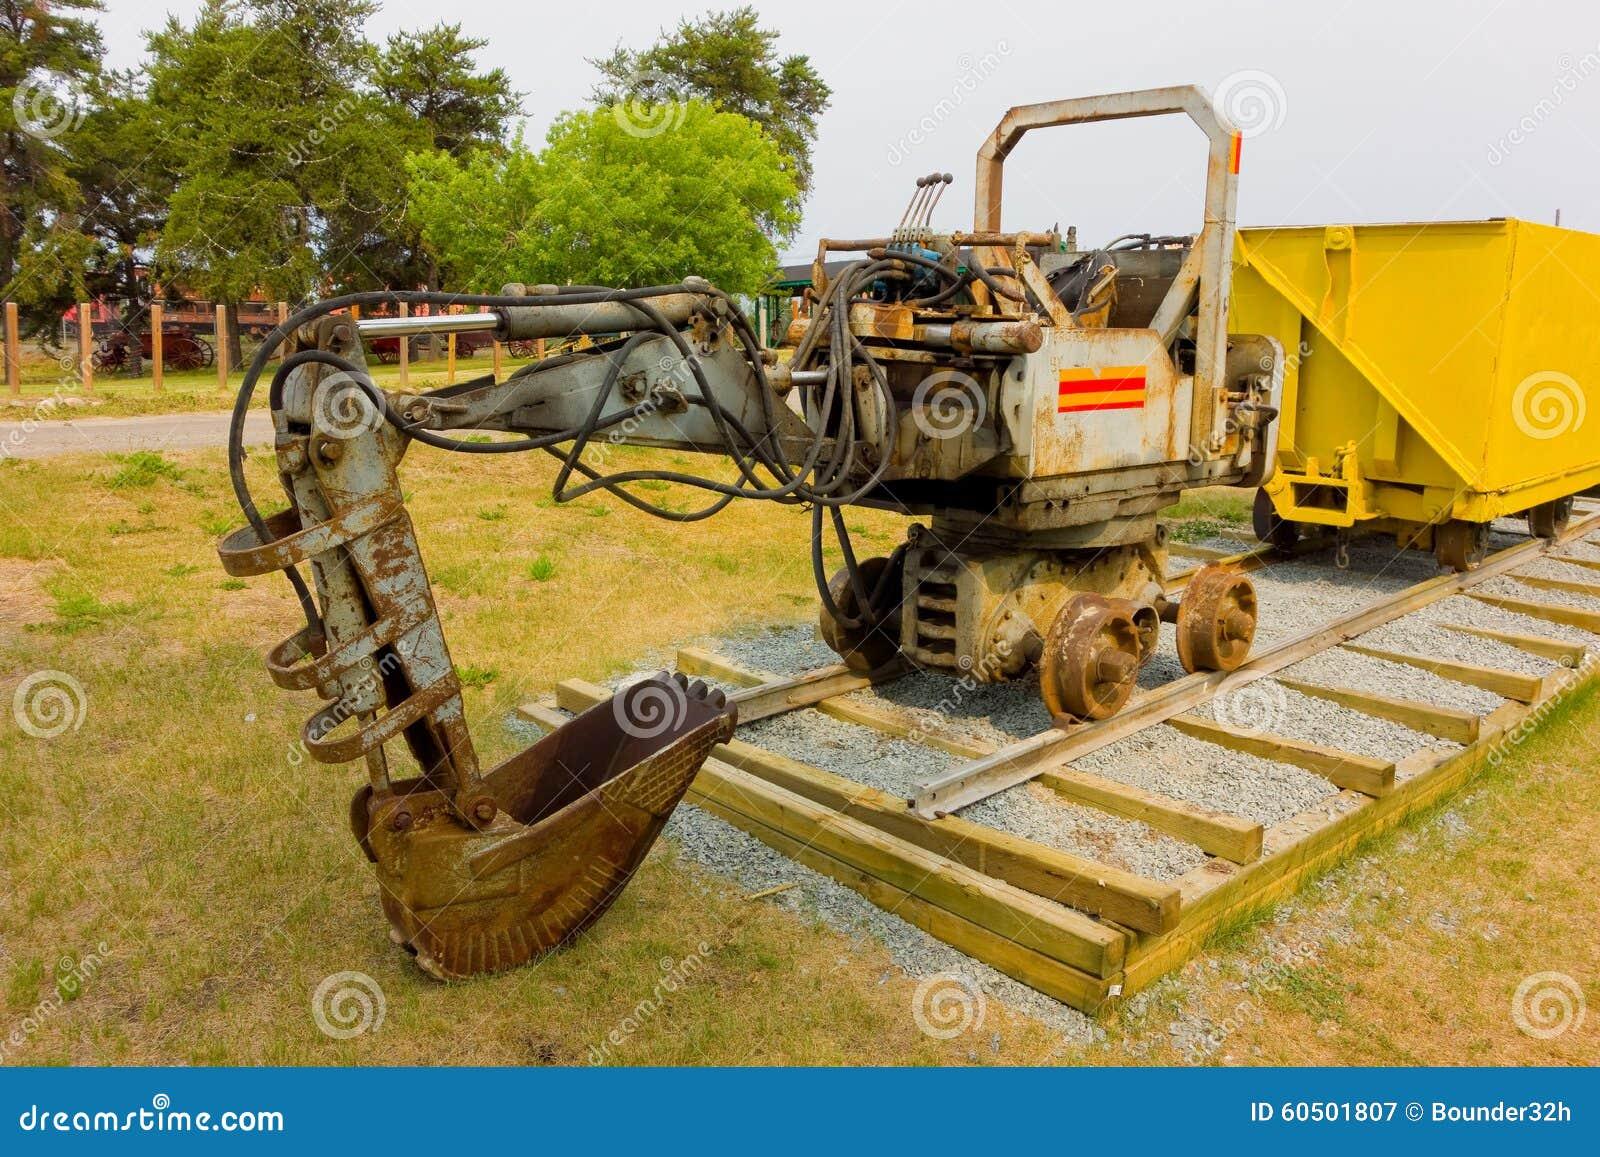 Mini Mining Equipment : An old mini excavator for underground mining stock photo